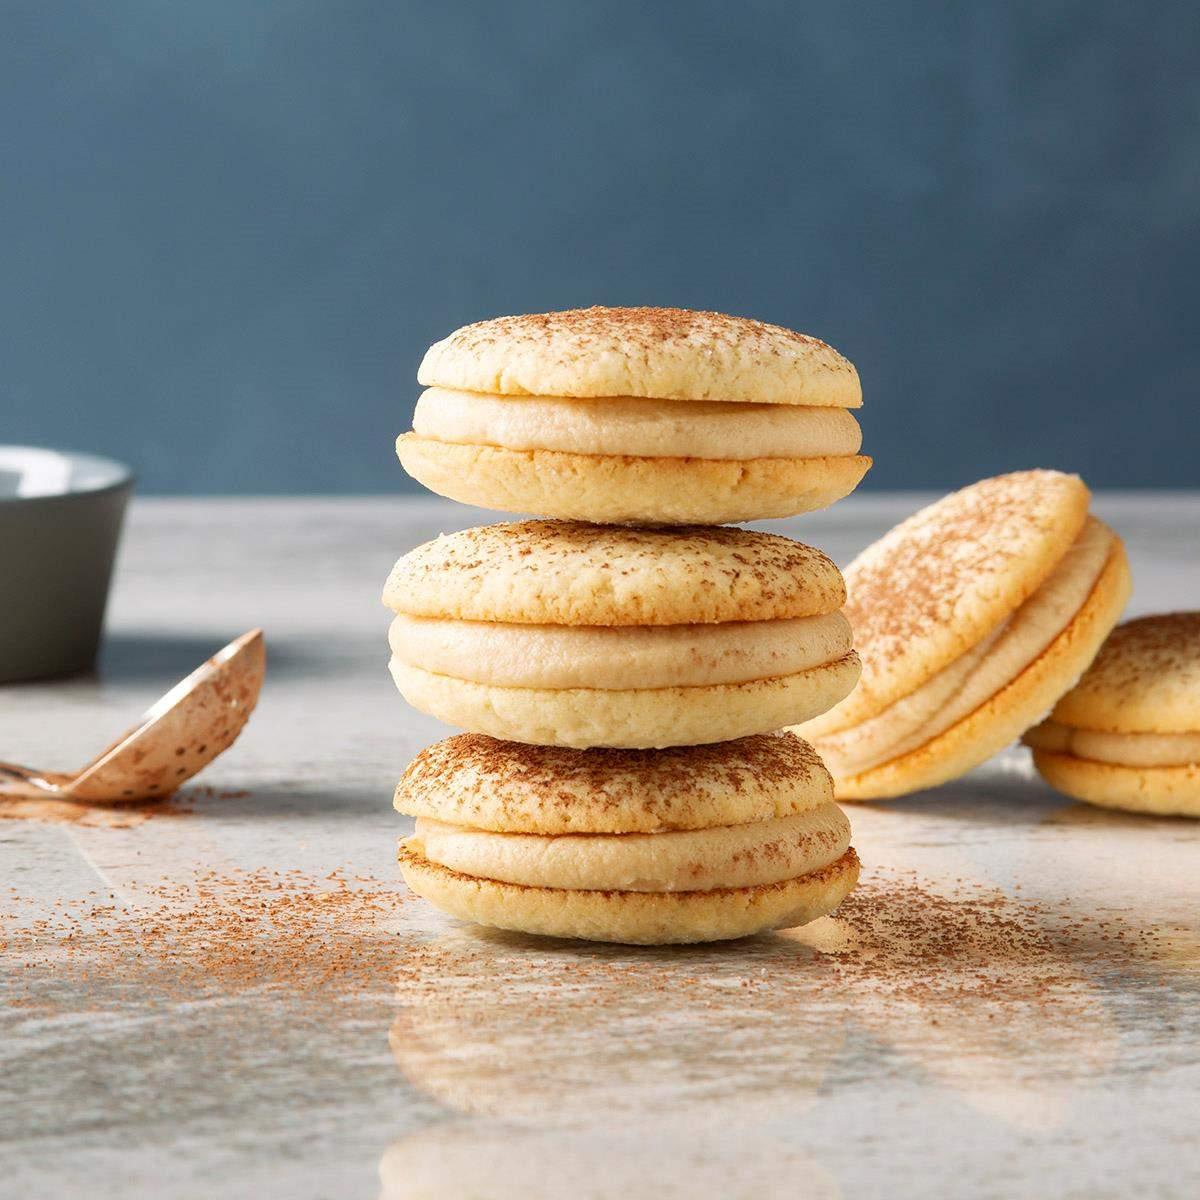 Receta de galletas tiramisú | Sabor de casa